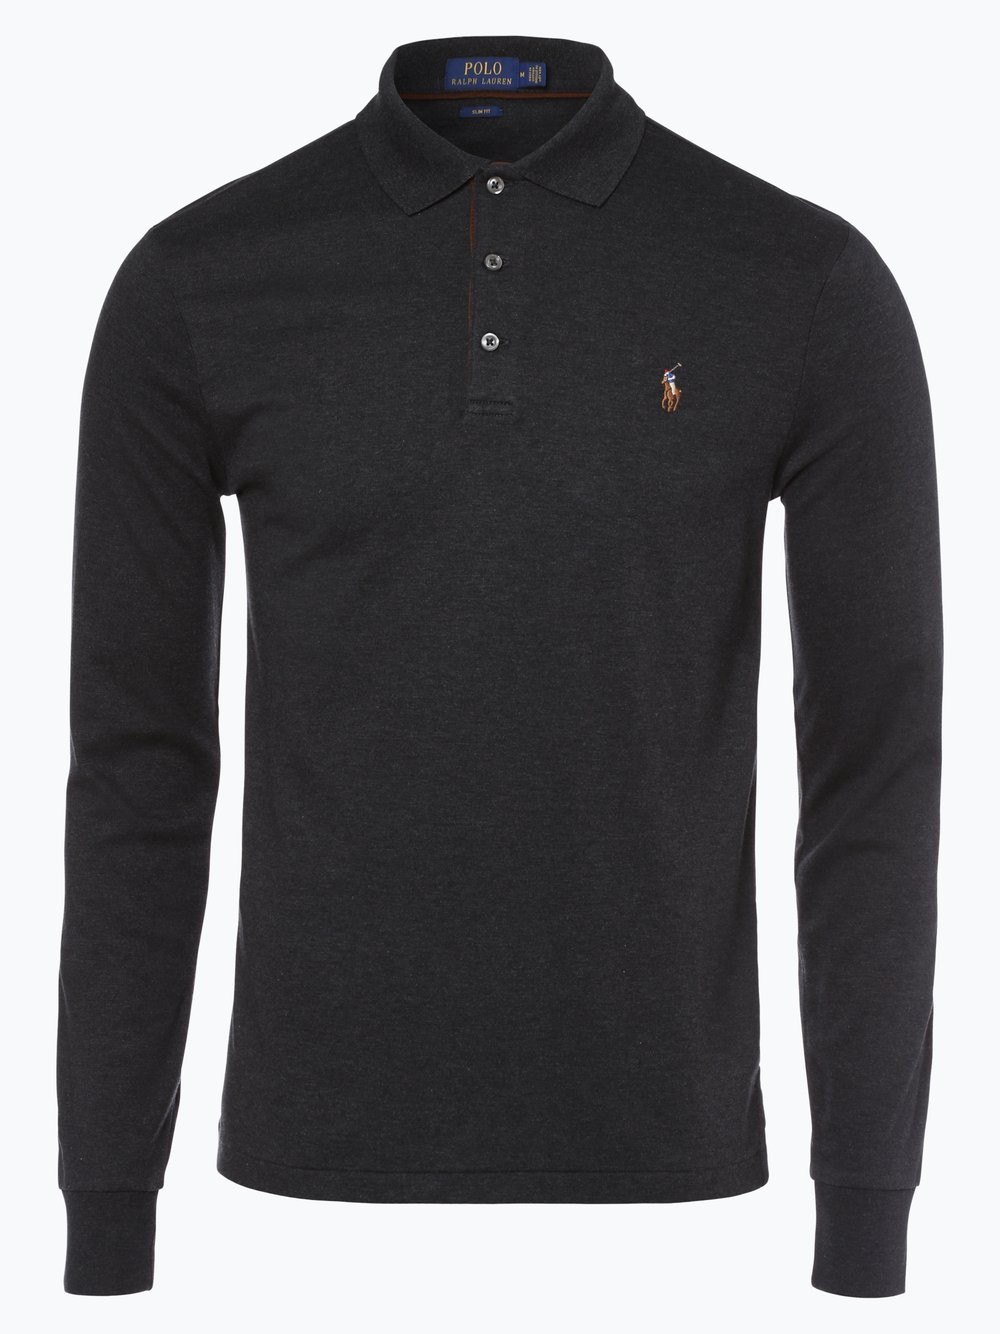 d52cfbd7590b Polo Ralph Lauren Herren Poloshirt - Slim Fit online kaufen ...